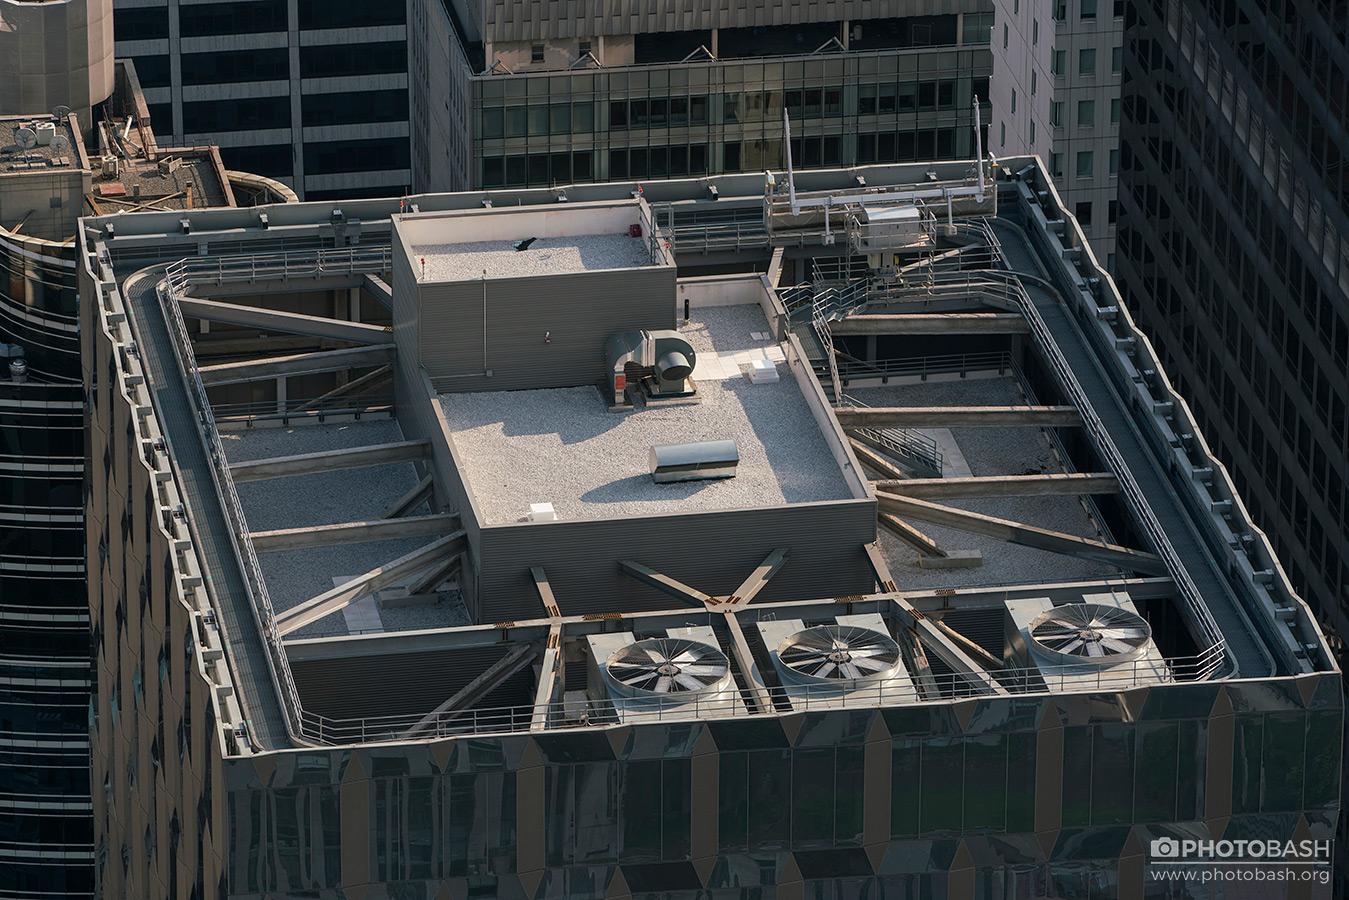 New-York-Skyline-Rooftop-Structures-Fan.jpg